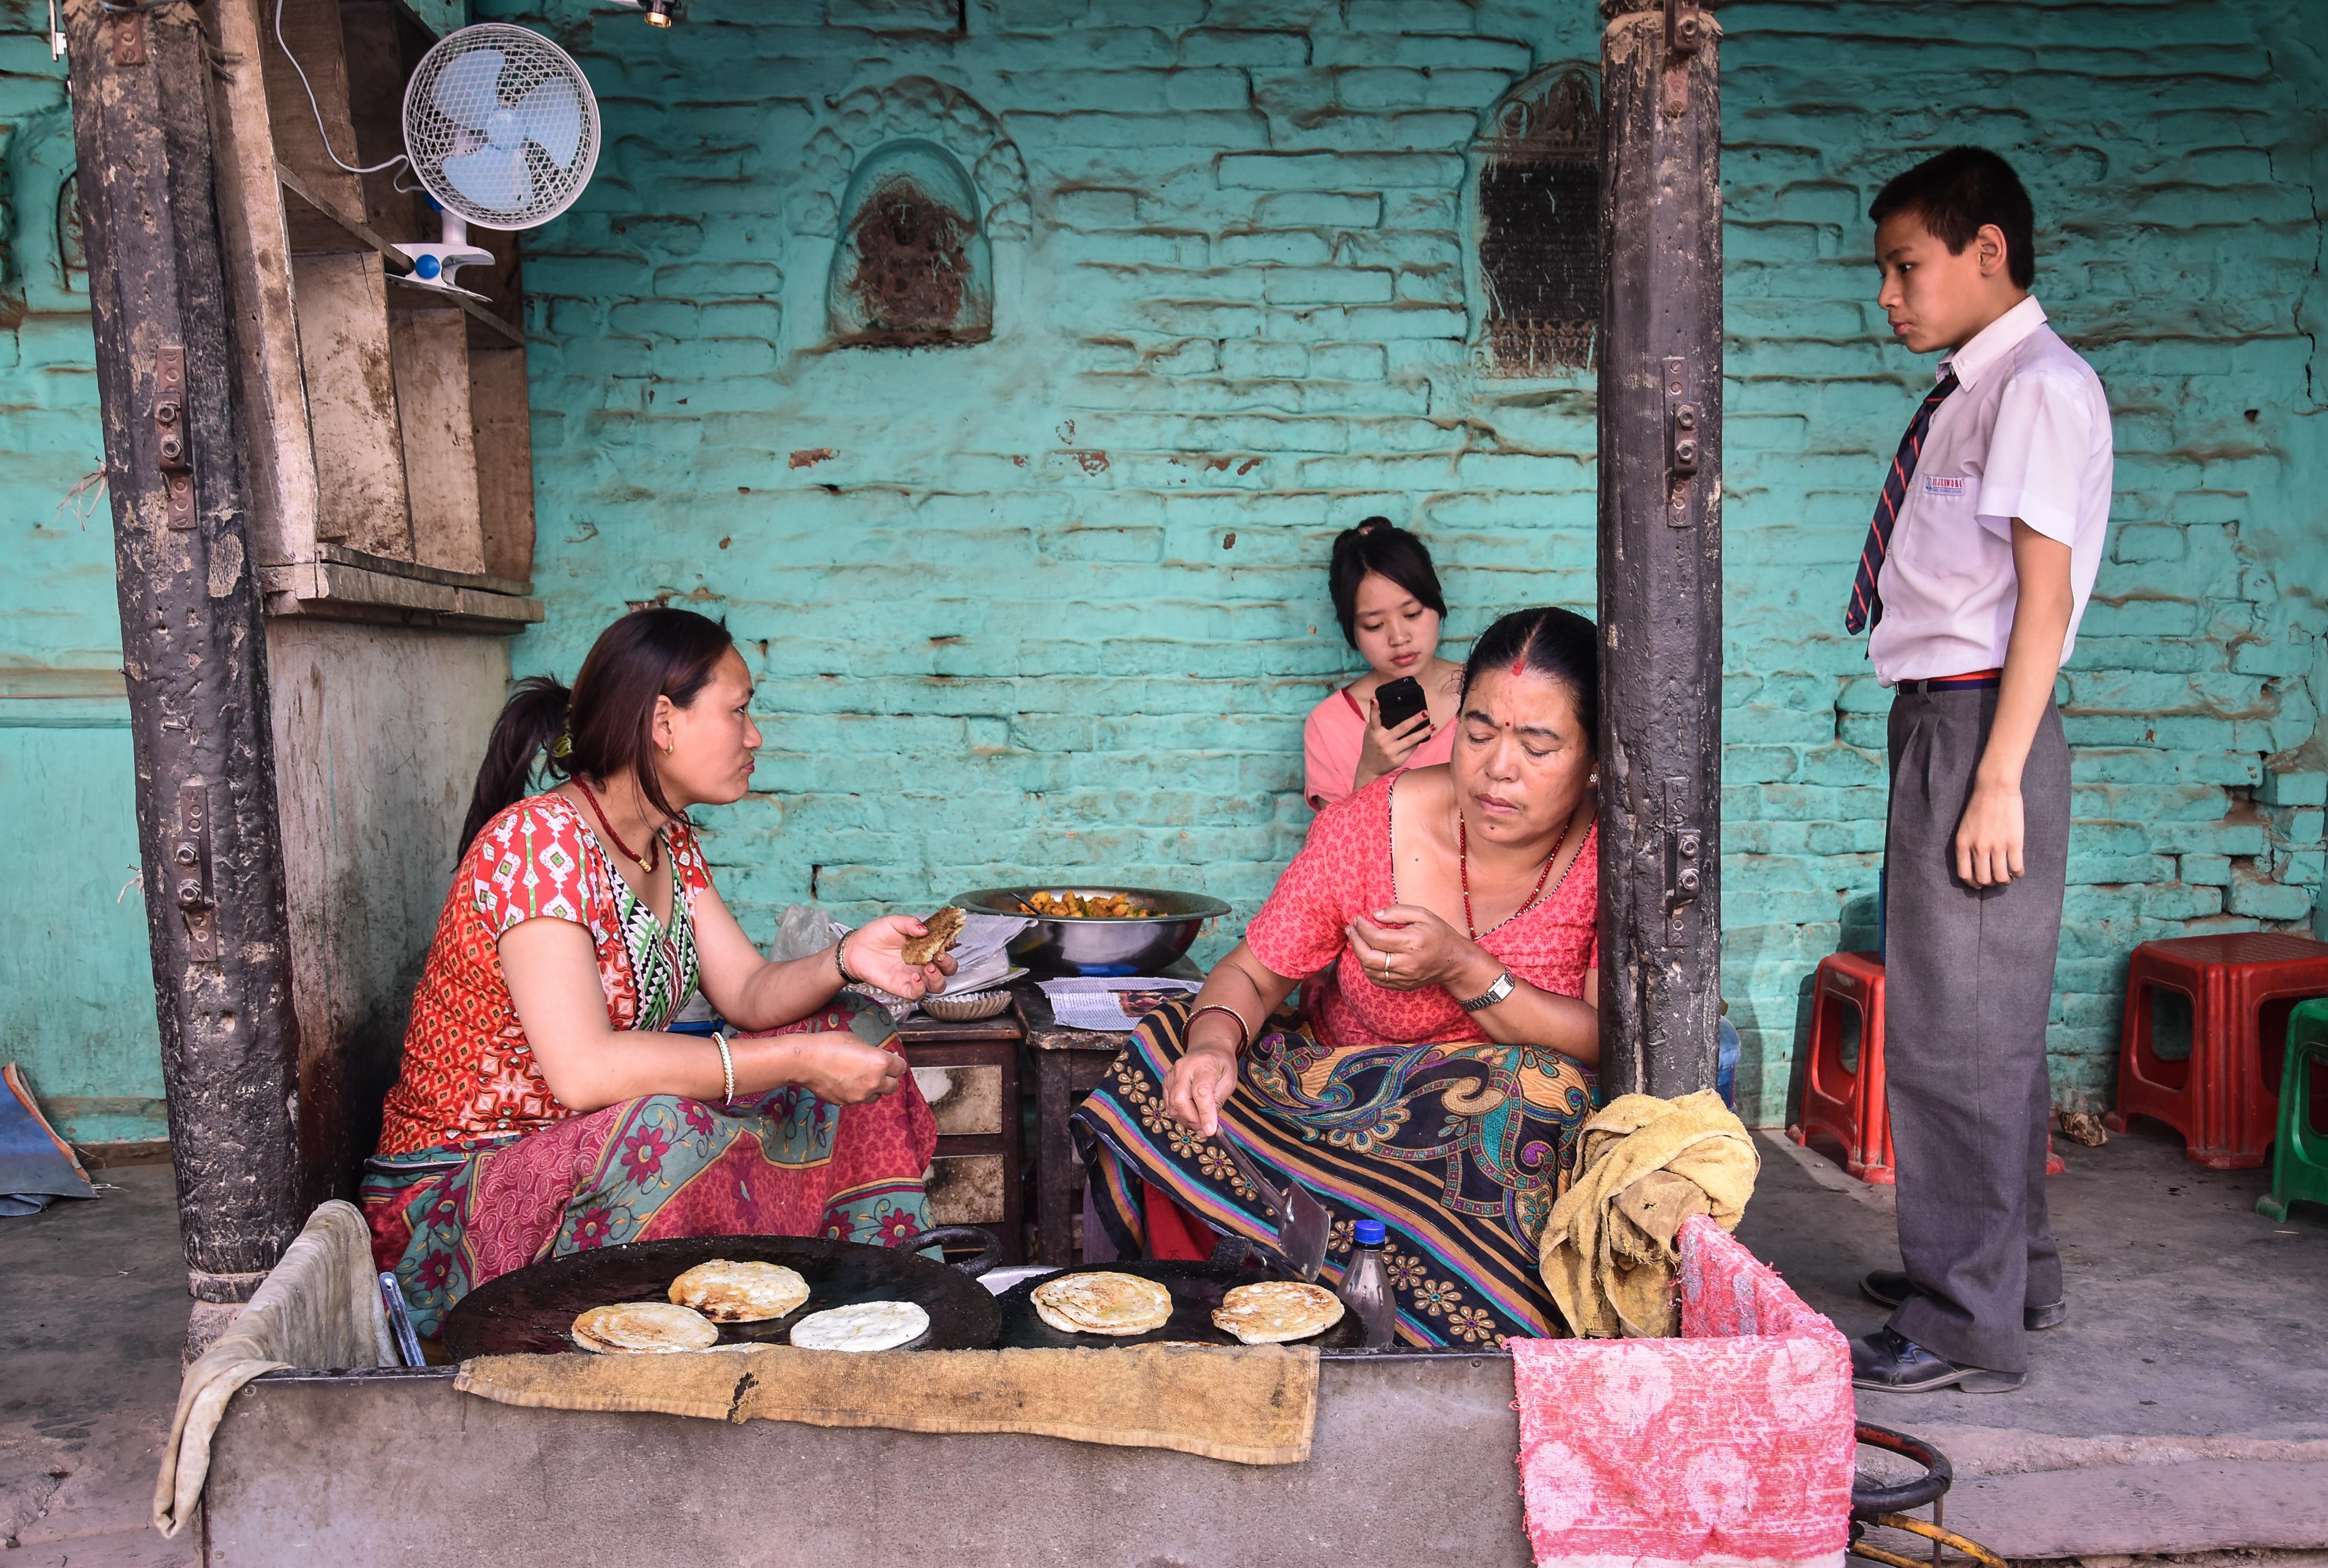 things-to-see-in-kathmandu-veronikasasdventure-com-48